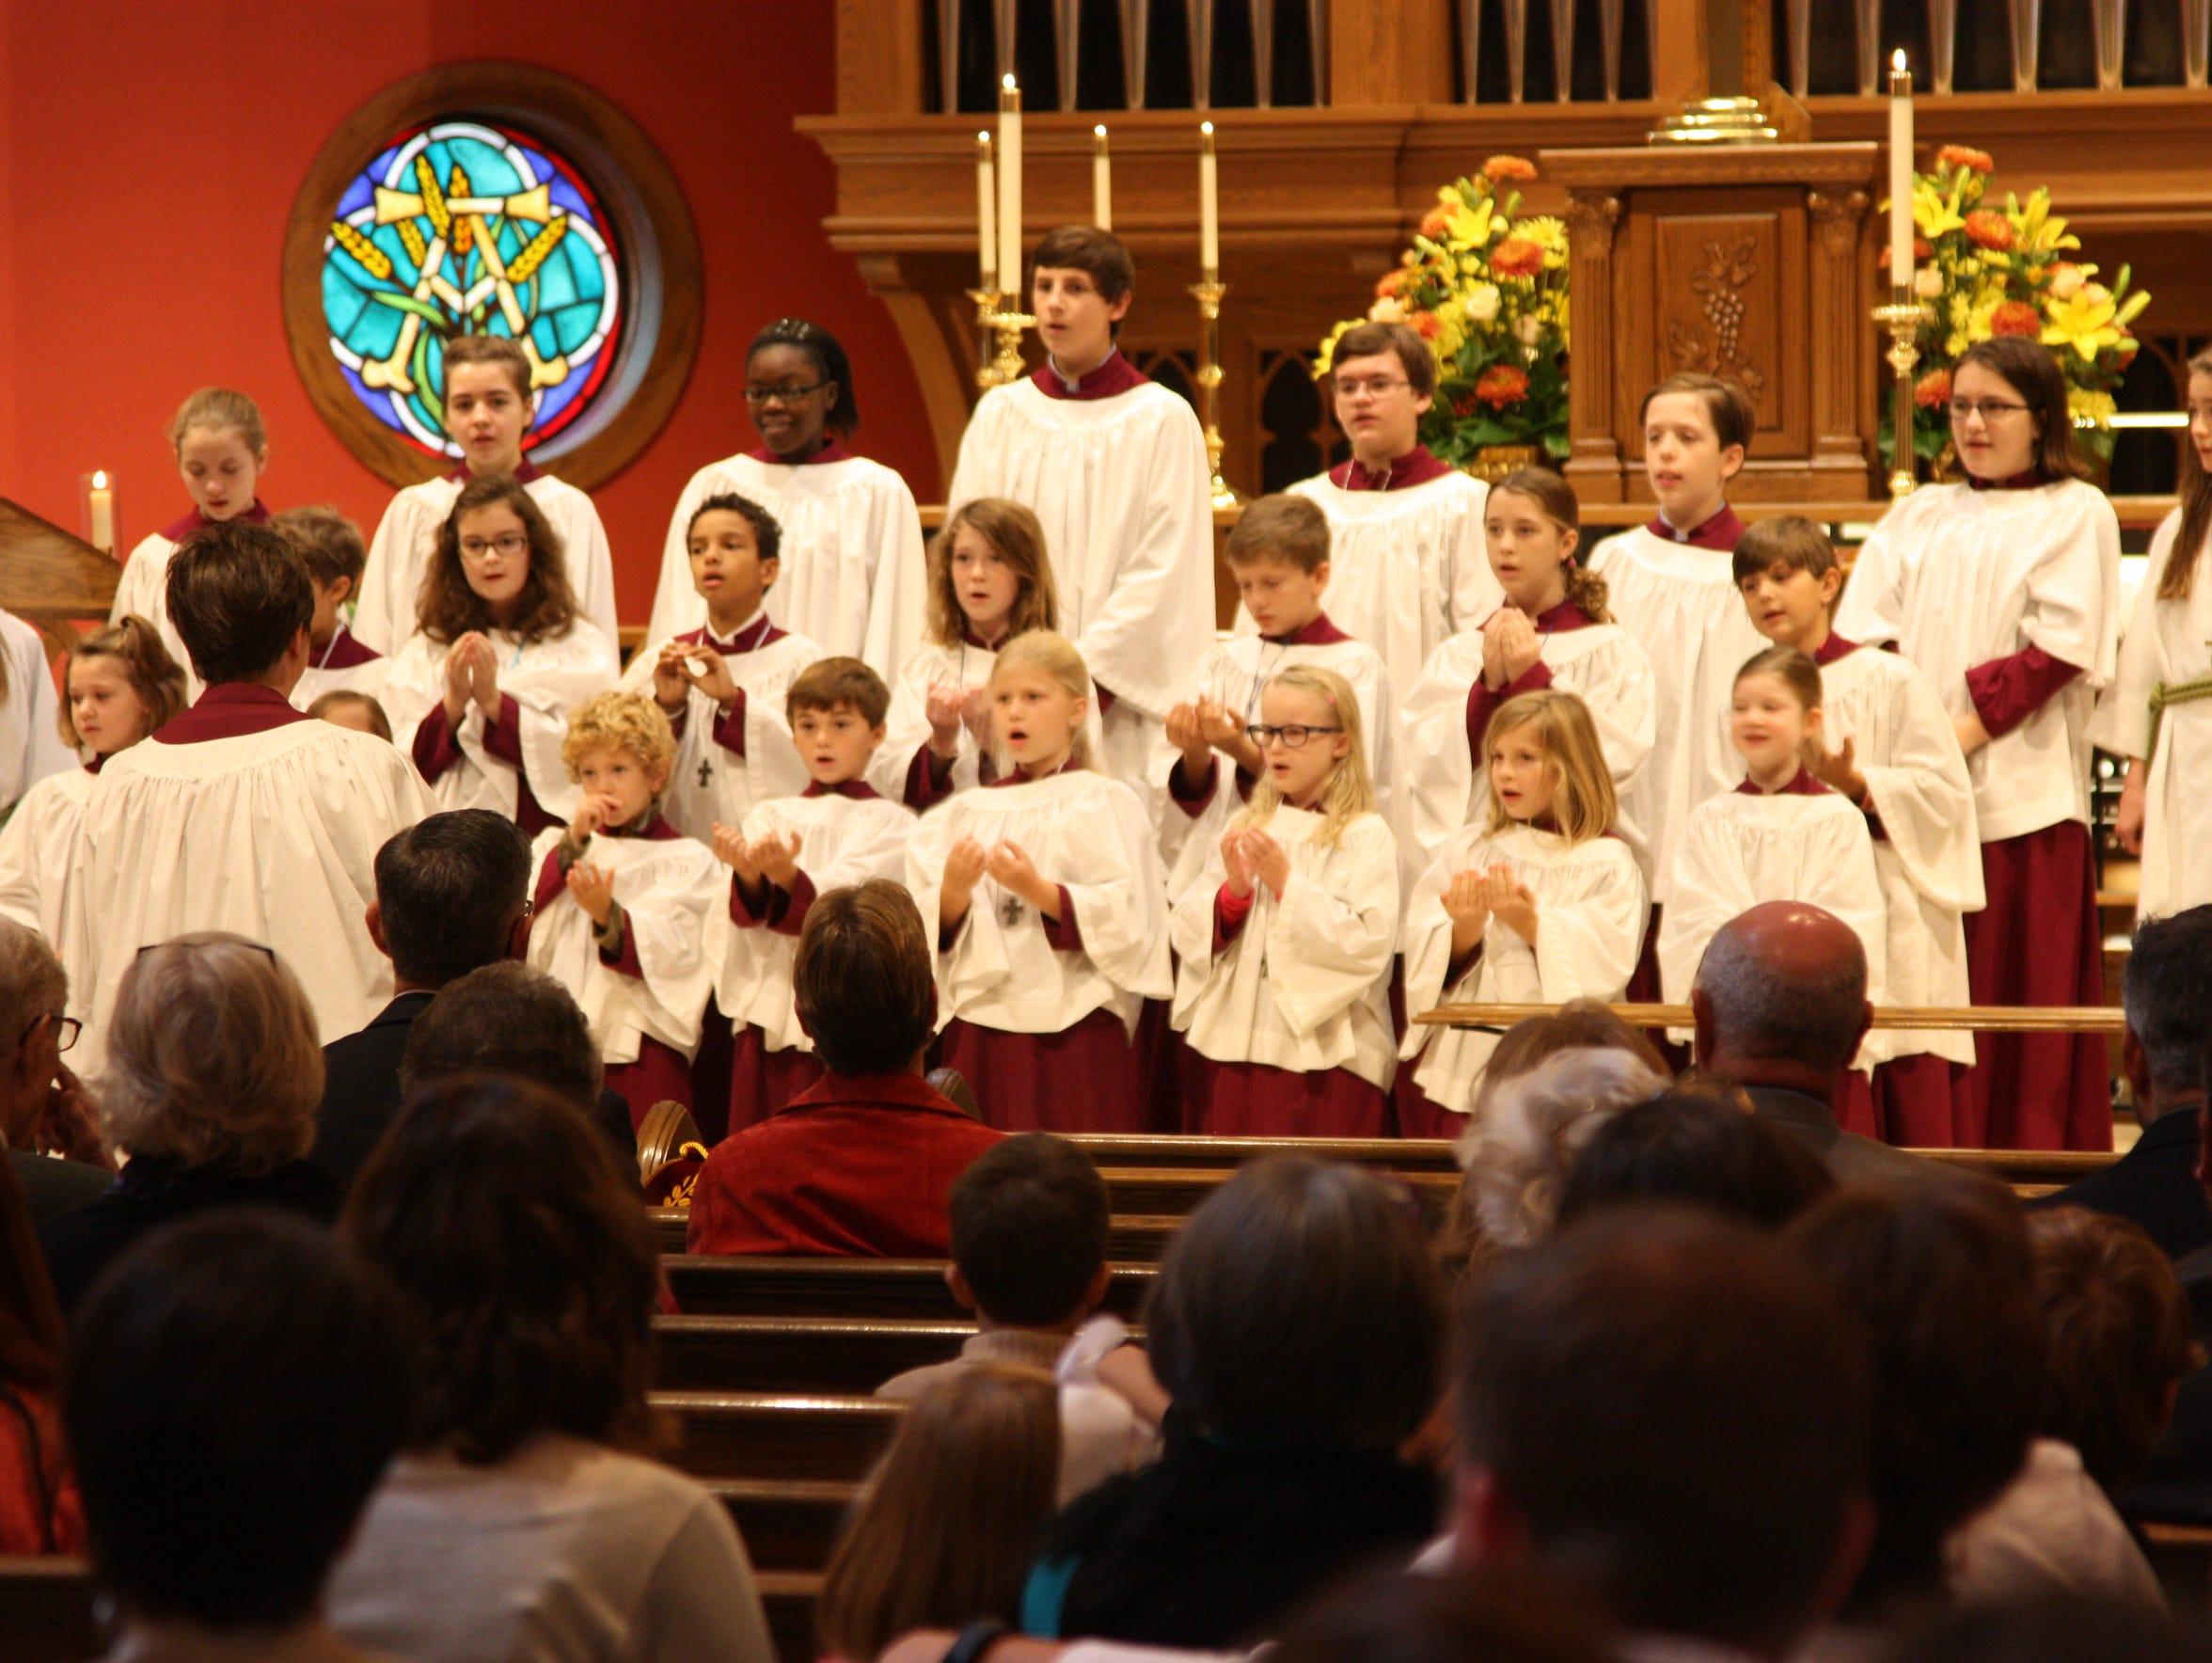 St. Paul's Episcopal Church in Murfreesboro will host